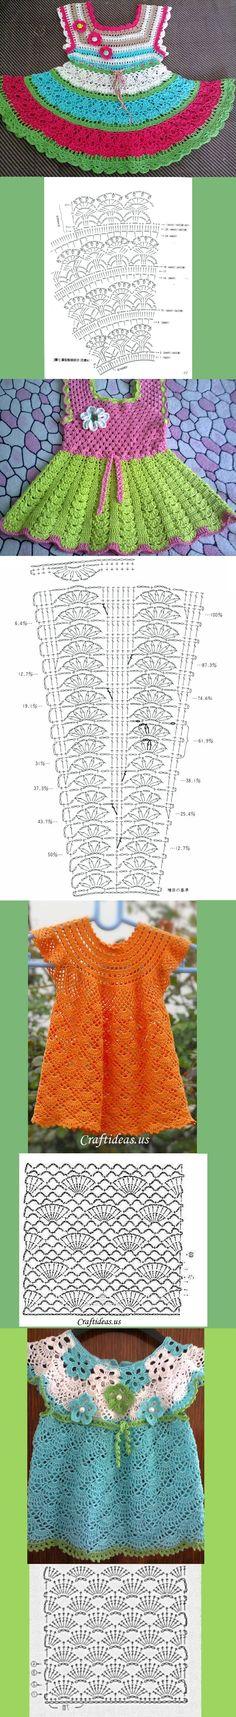 МИЛЕНЬКИЕ ПЛАТЬИЦА ОТ ЕЛЕНЫ БОКК. liveinternet.ru/users/olga_knoll_2/post354247732/# Knitting For Kids, Crochet For Kids, Diy Crochet, Baby Knitting, Crochet Hats, Crochet Stitches, Crochet Patterns, Baby Dress Patterns, Baby Girl Crochet